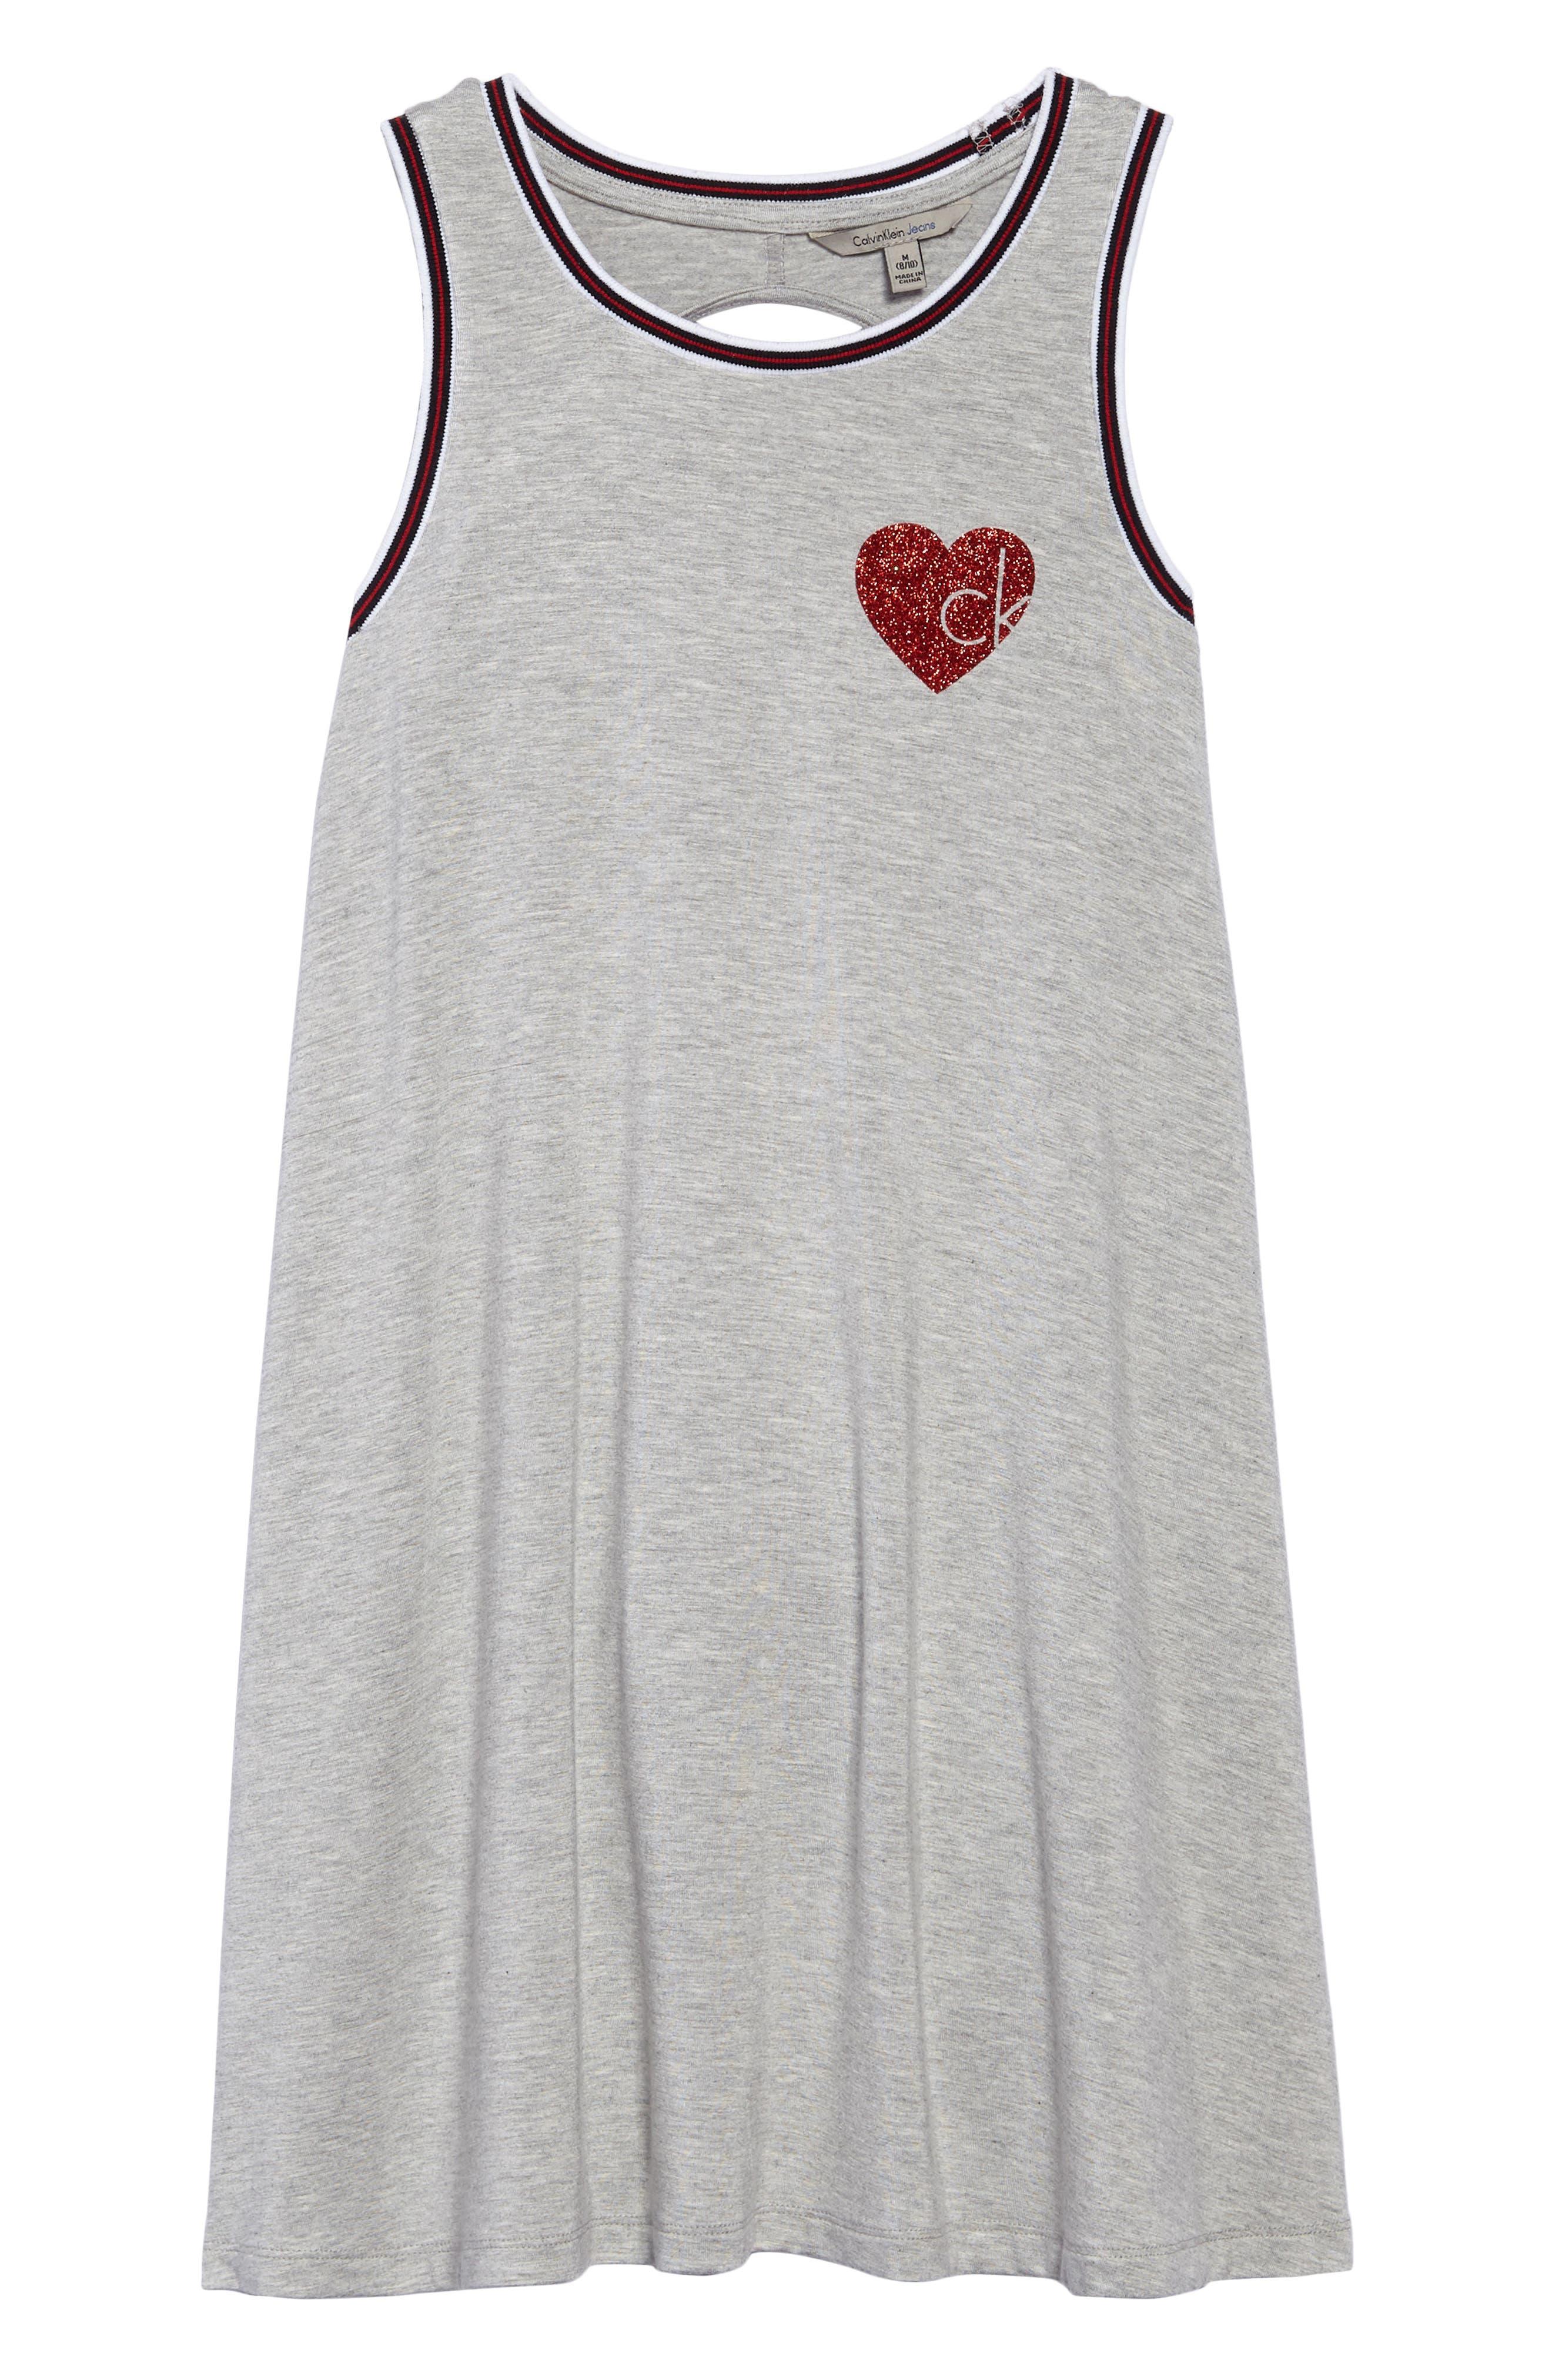 Athleisure Sleeveless Dress,                         Main,                         color, Grey Heather